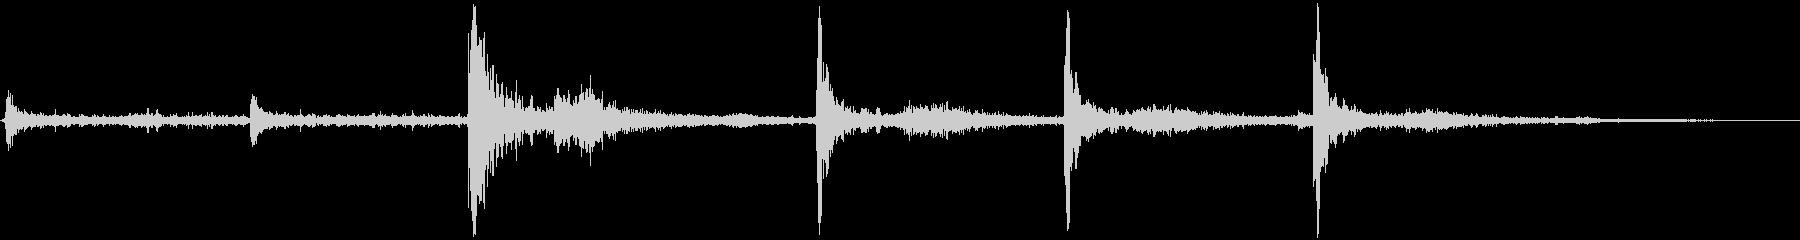 HOWITZER M101 A1、...の未再生の波形